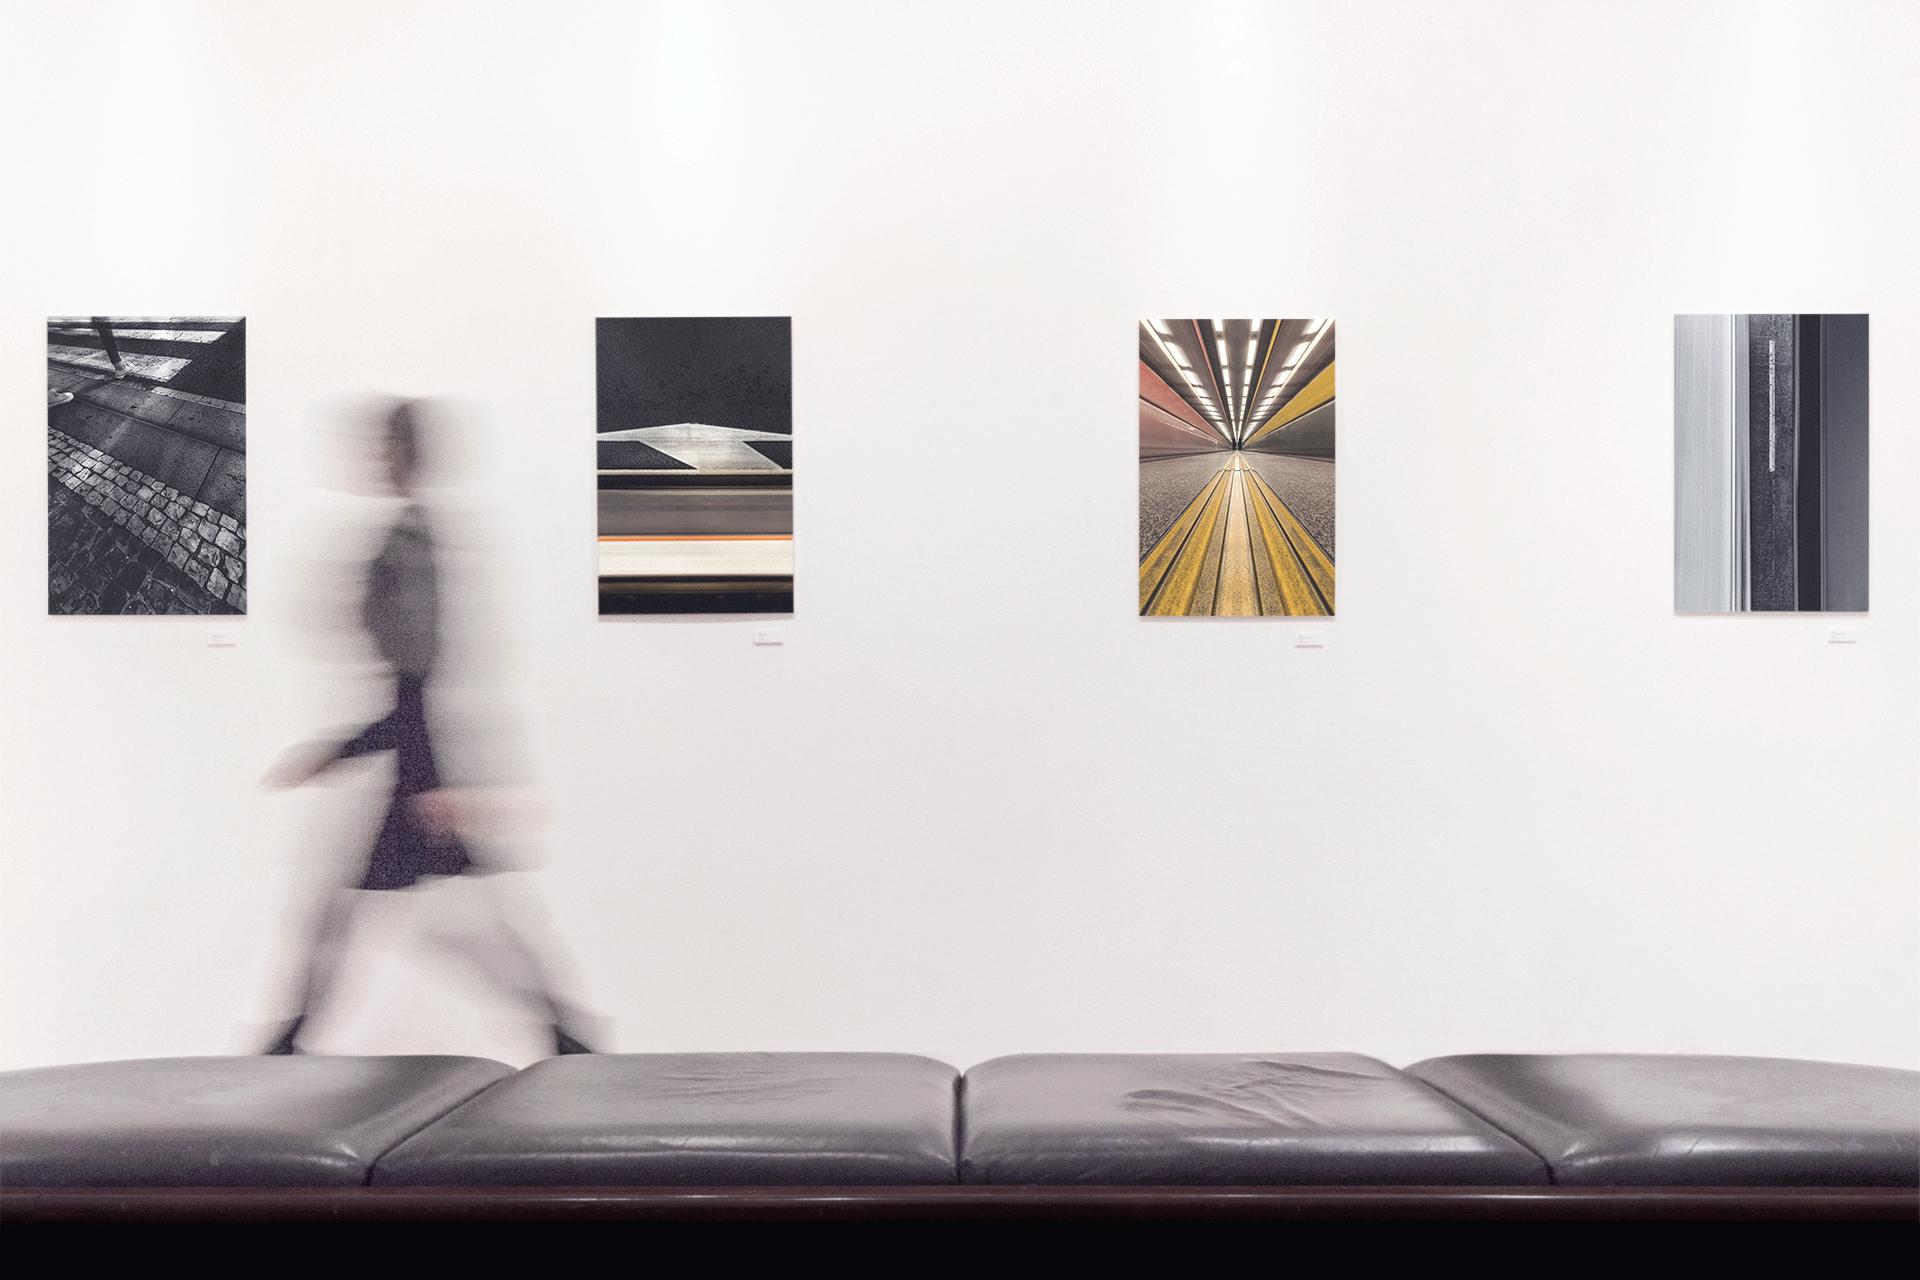 In+Transit+bonjourmolotov+André+Gigante+Experimenta+Design+2015+EXD15+Photography+Exhibition+Exposição+Fotografia+Cooperativa+Árvore+02+N4N4.jpg